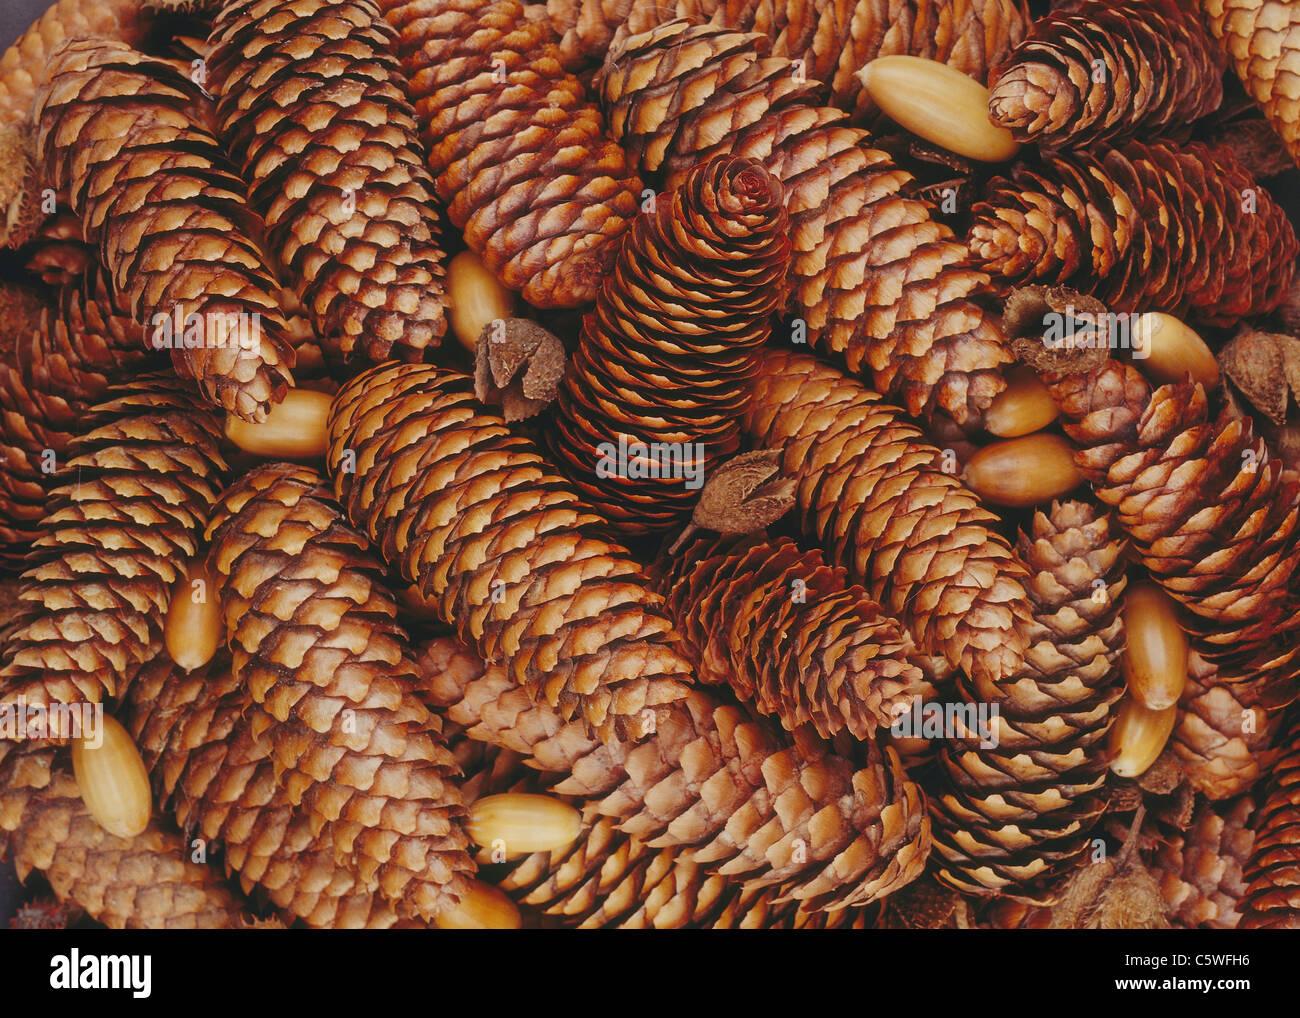 Kiefer Kegel Hintergrund, Nahaufnahme Stockbild